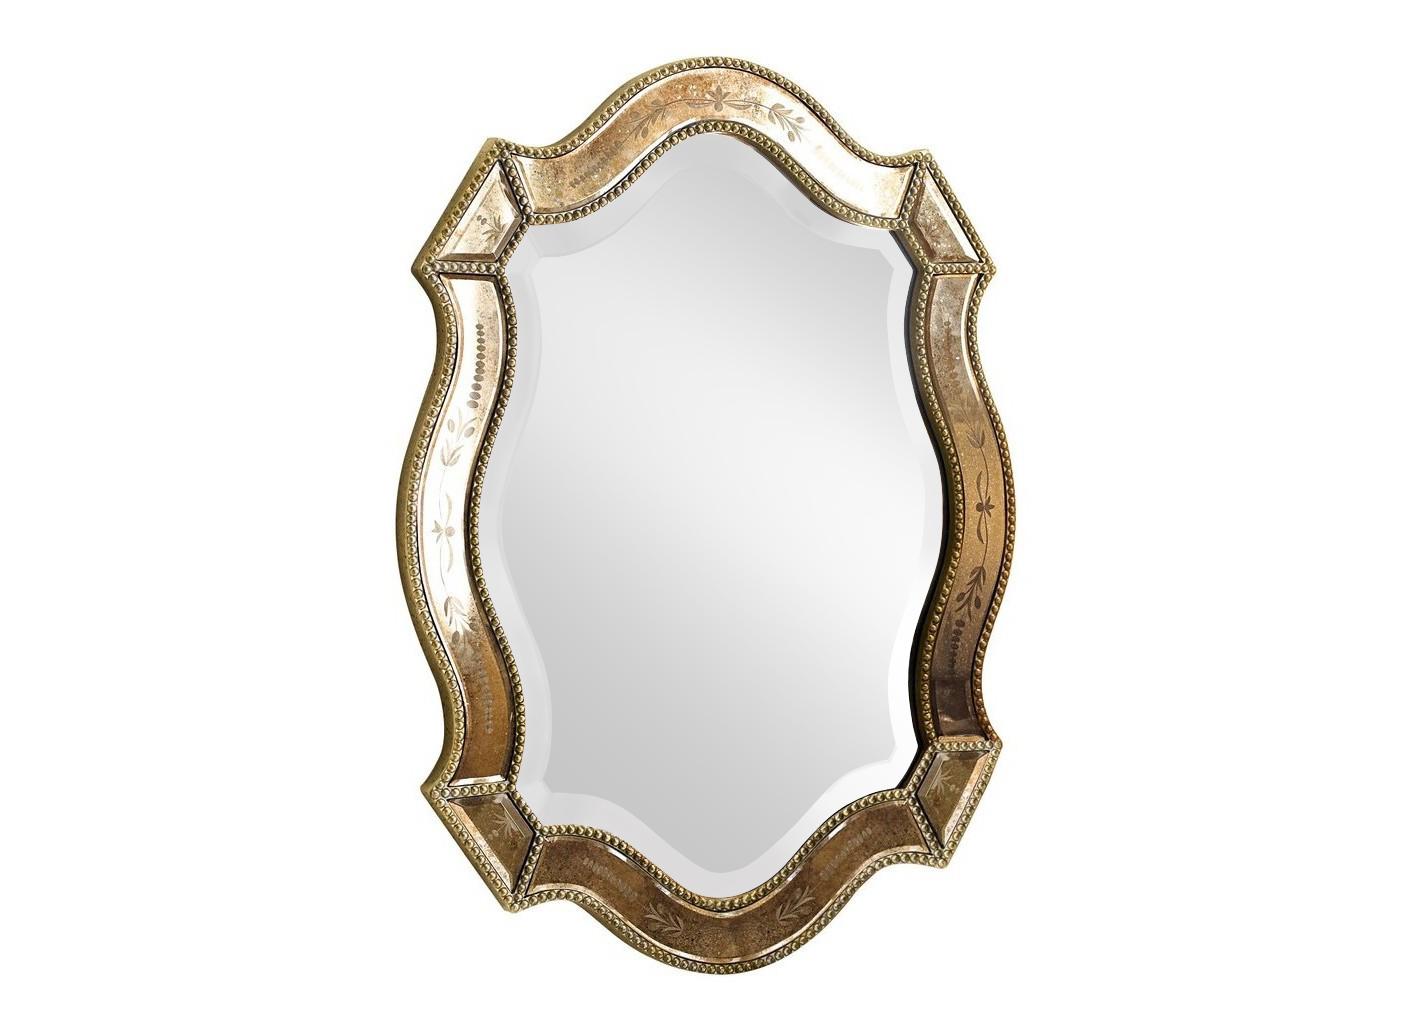 Зеркало СтеллаНастенные зеркала<br><br><br>Material: Стекло<br>Ширина см: 52.0<br>Высота см: 70.0<br>Глубина см: 3.0